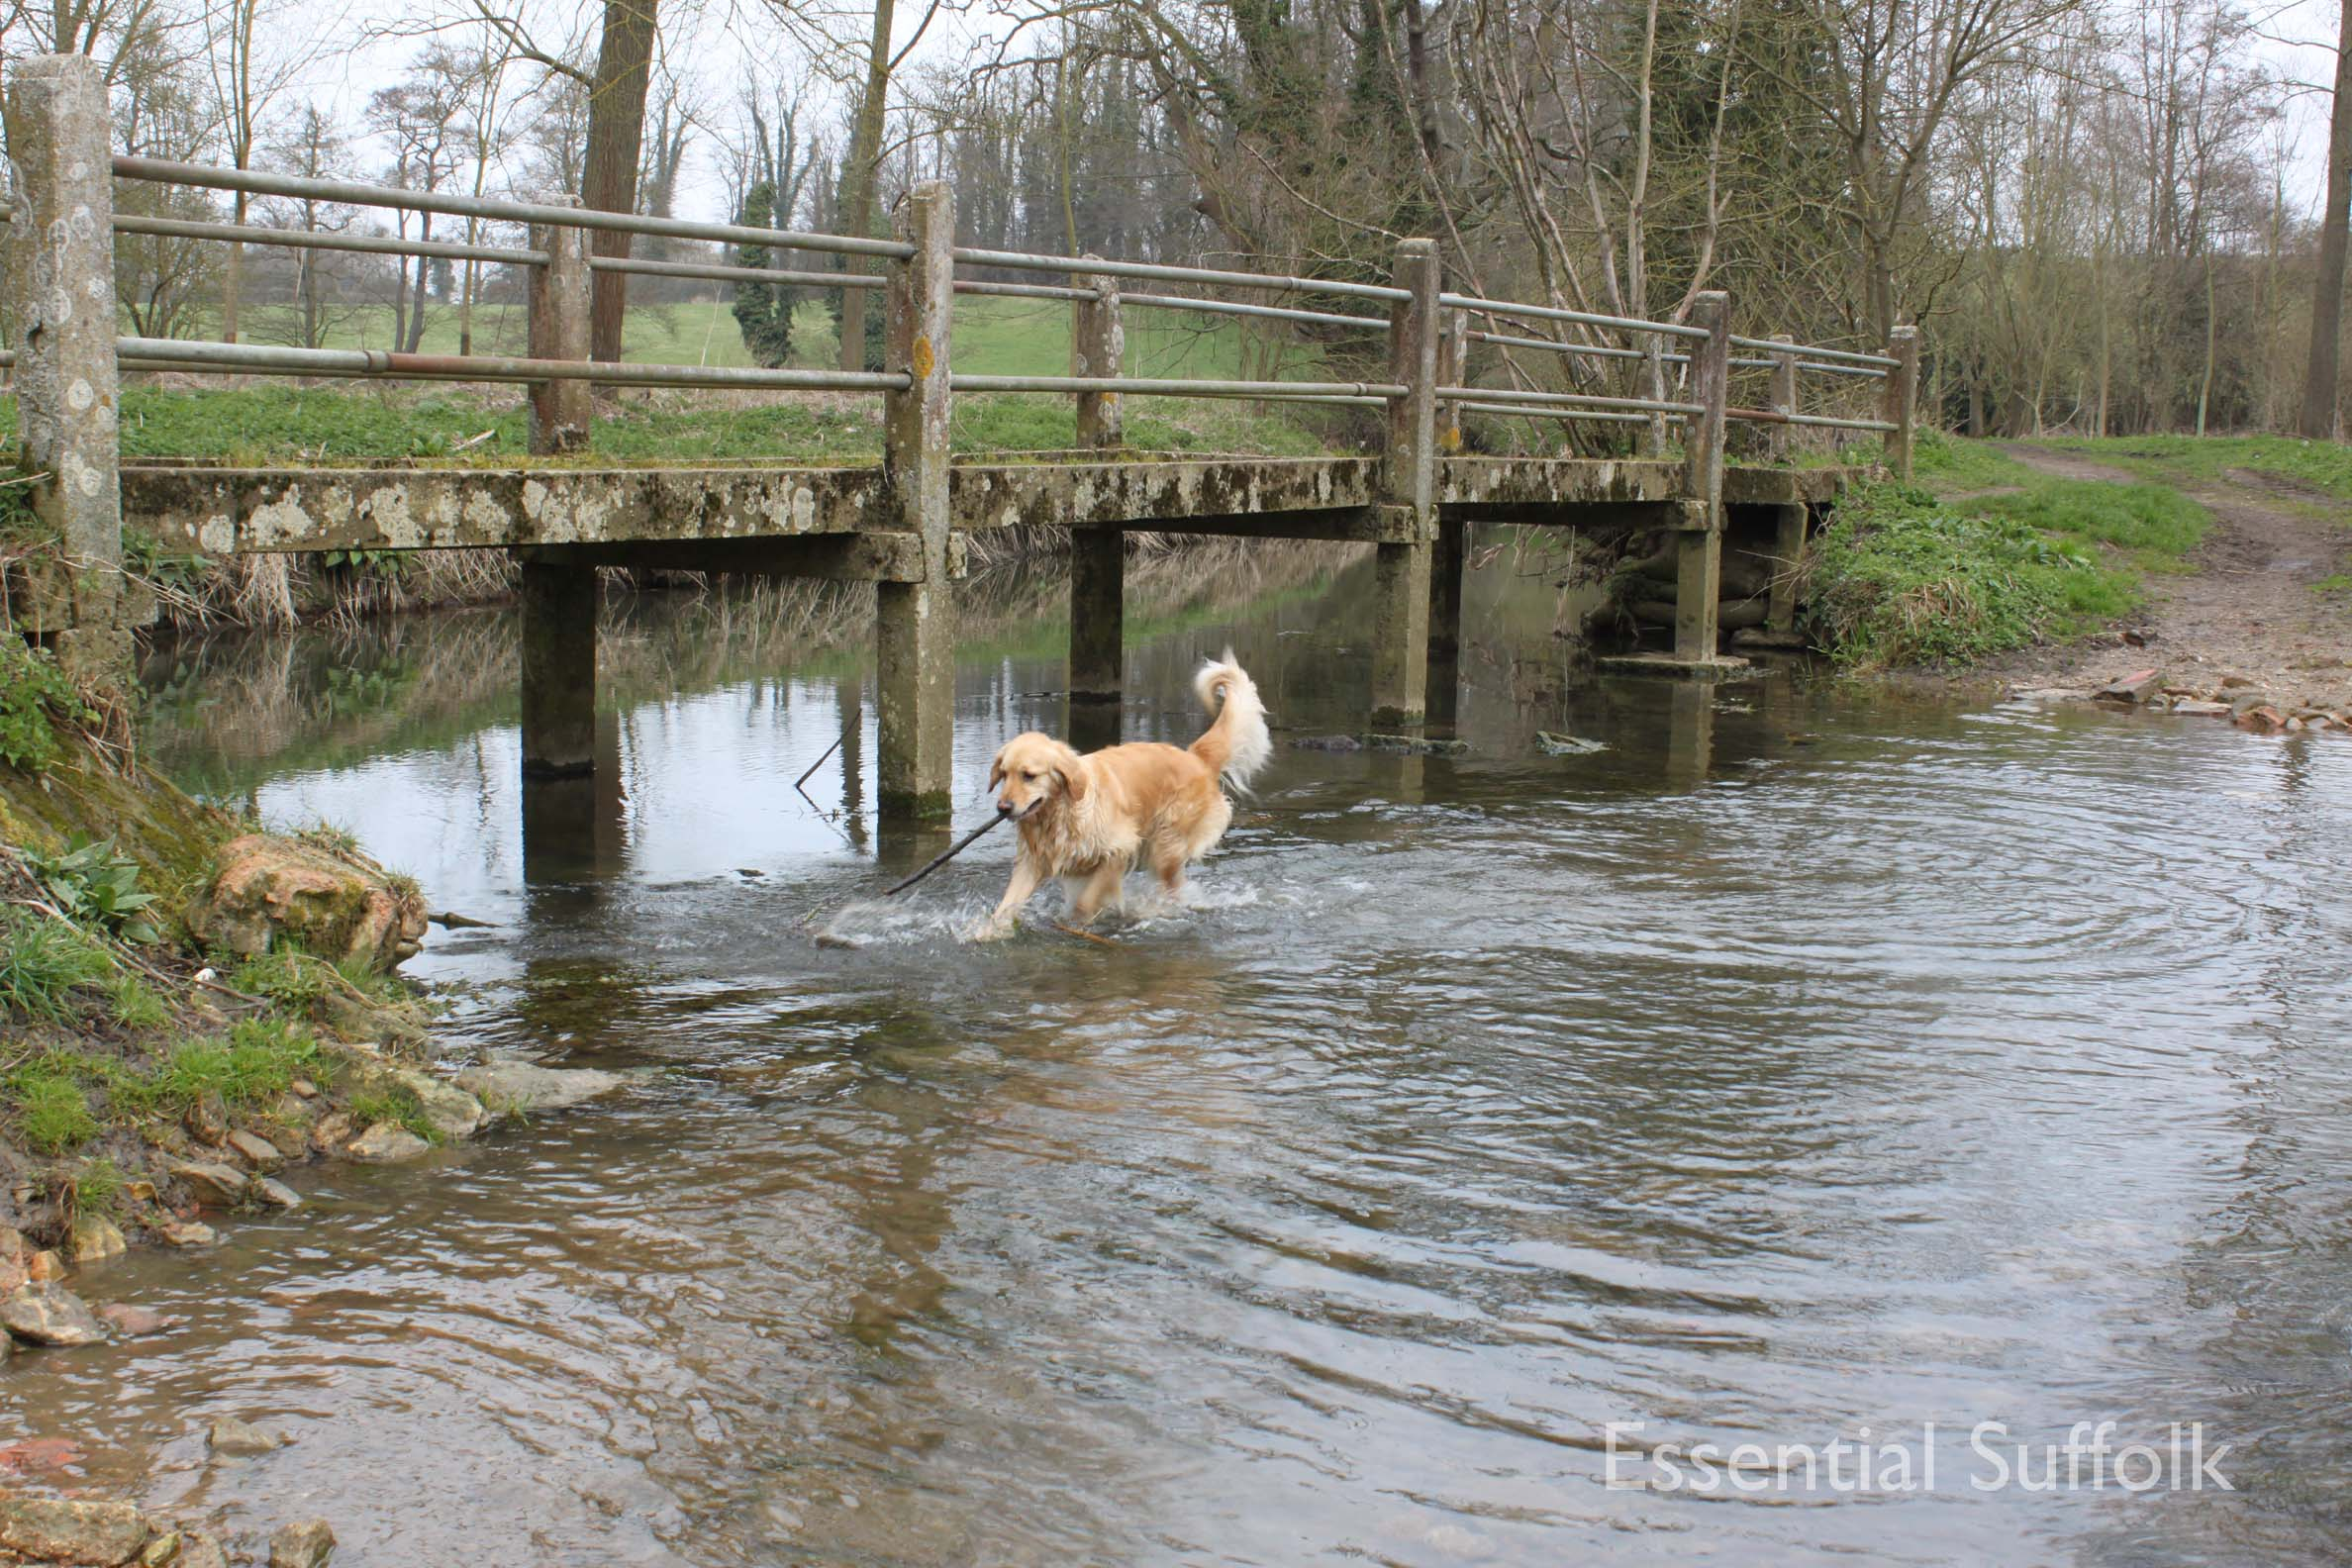 Cretingham dog walk11.jpg